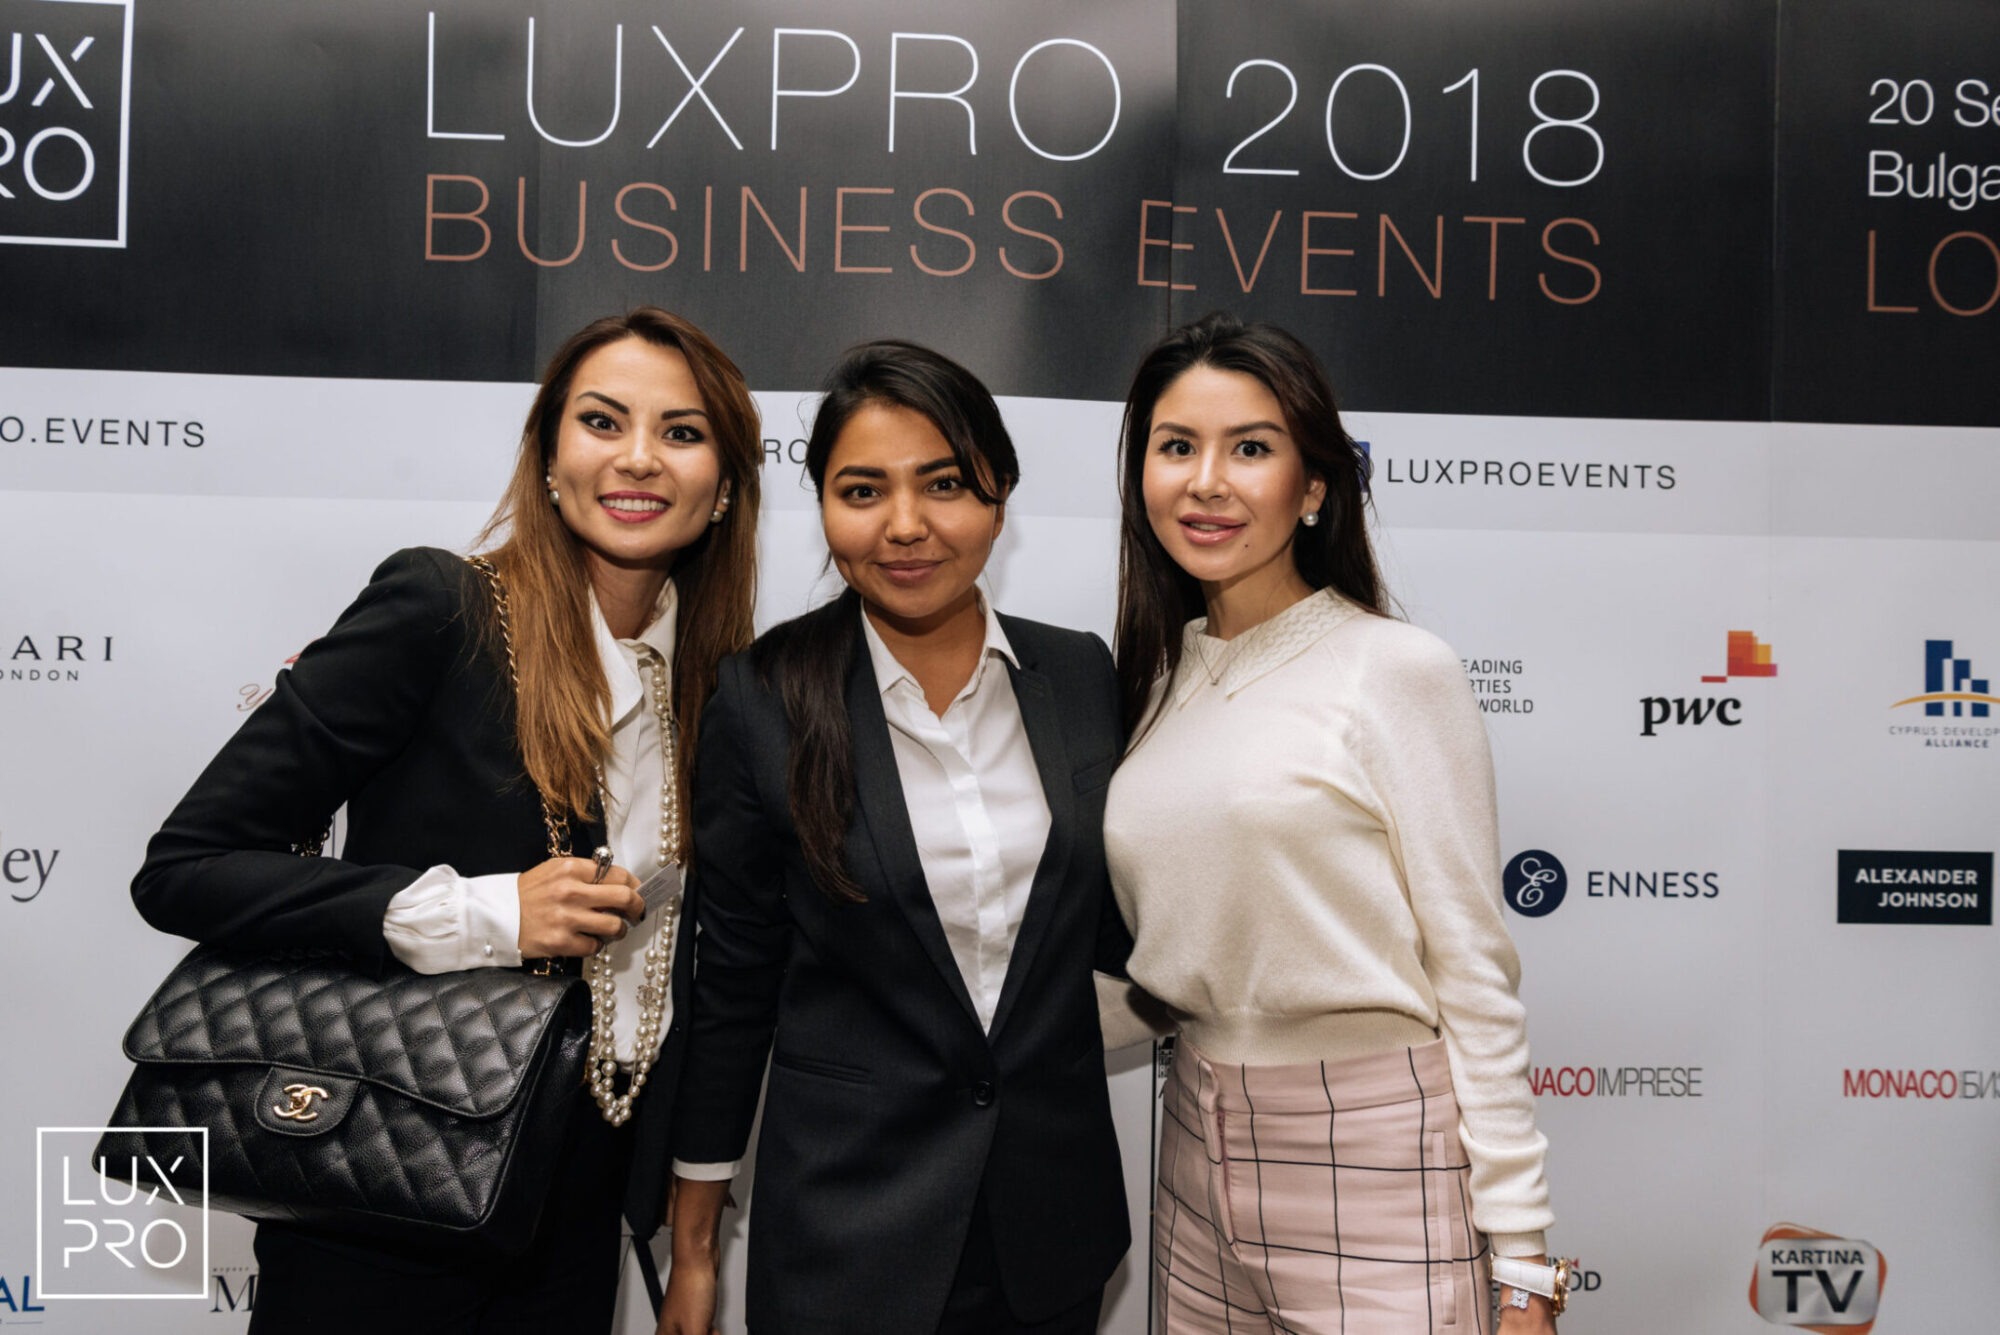 Luxpro_London_Buvgari